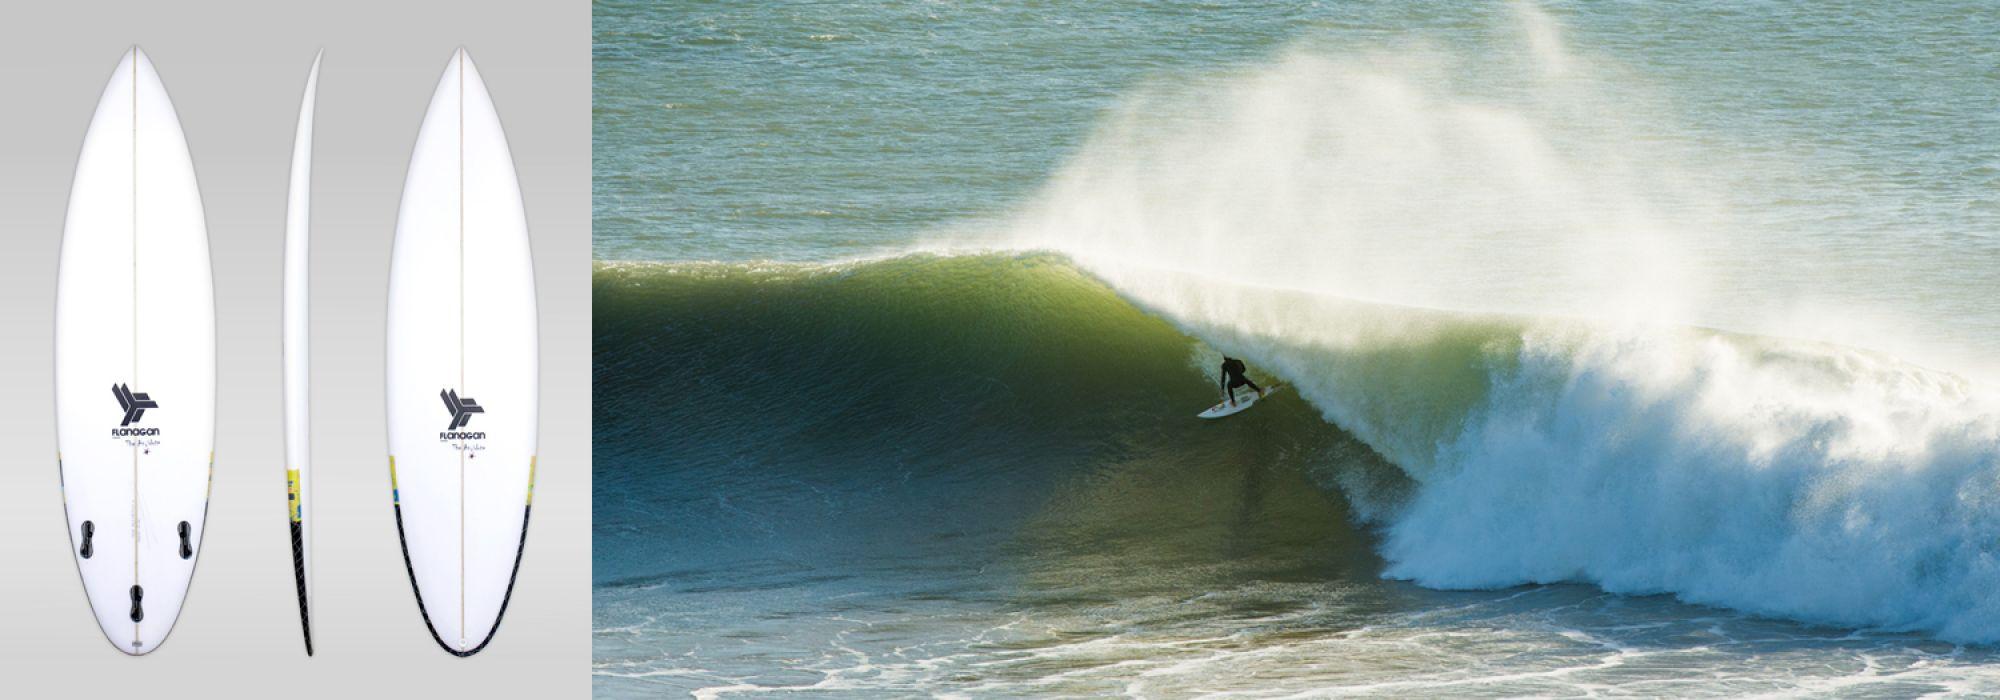 Flanagan Surfboards